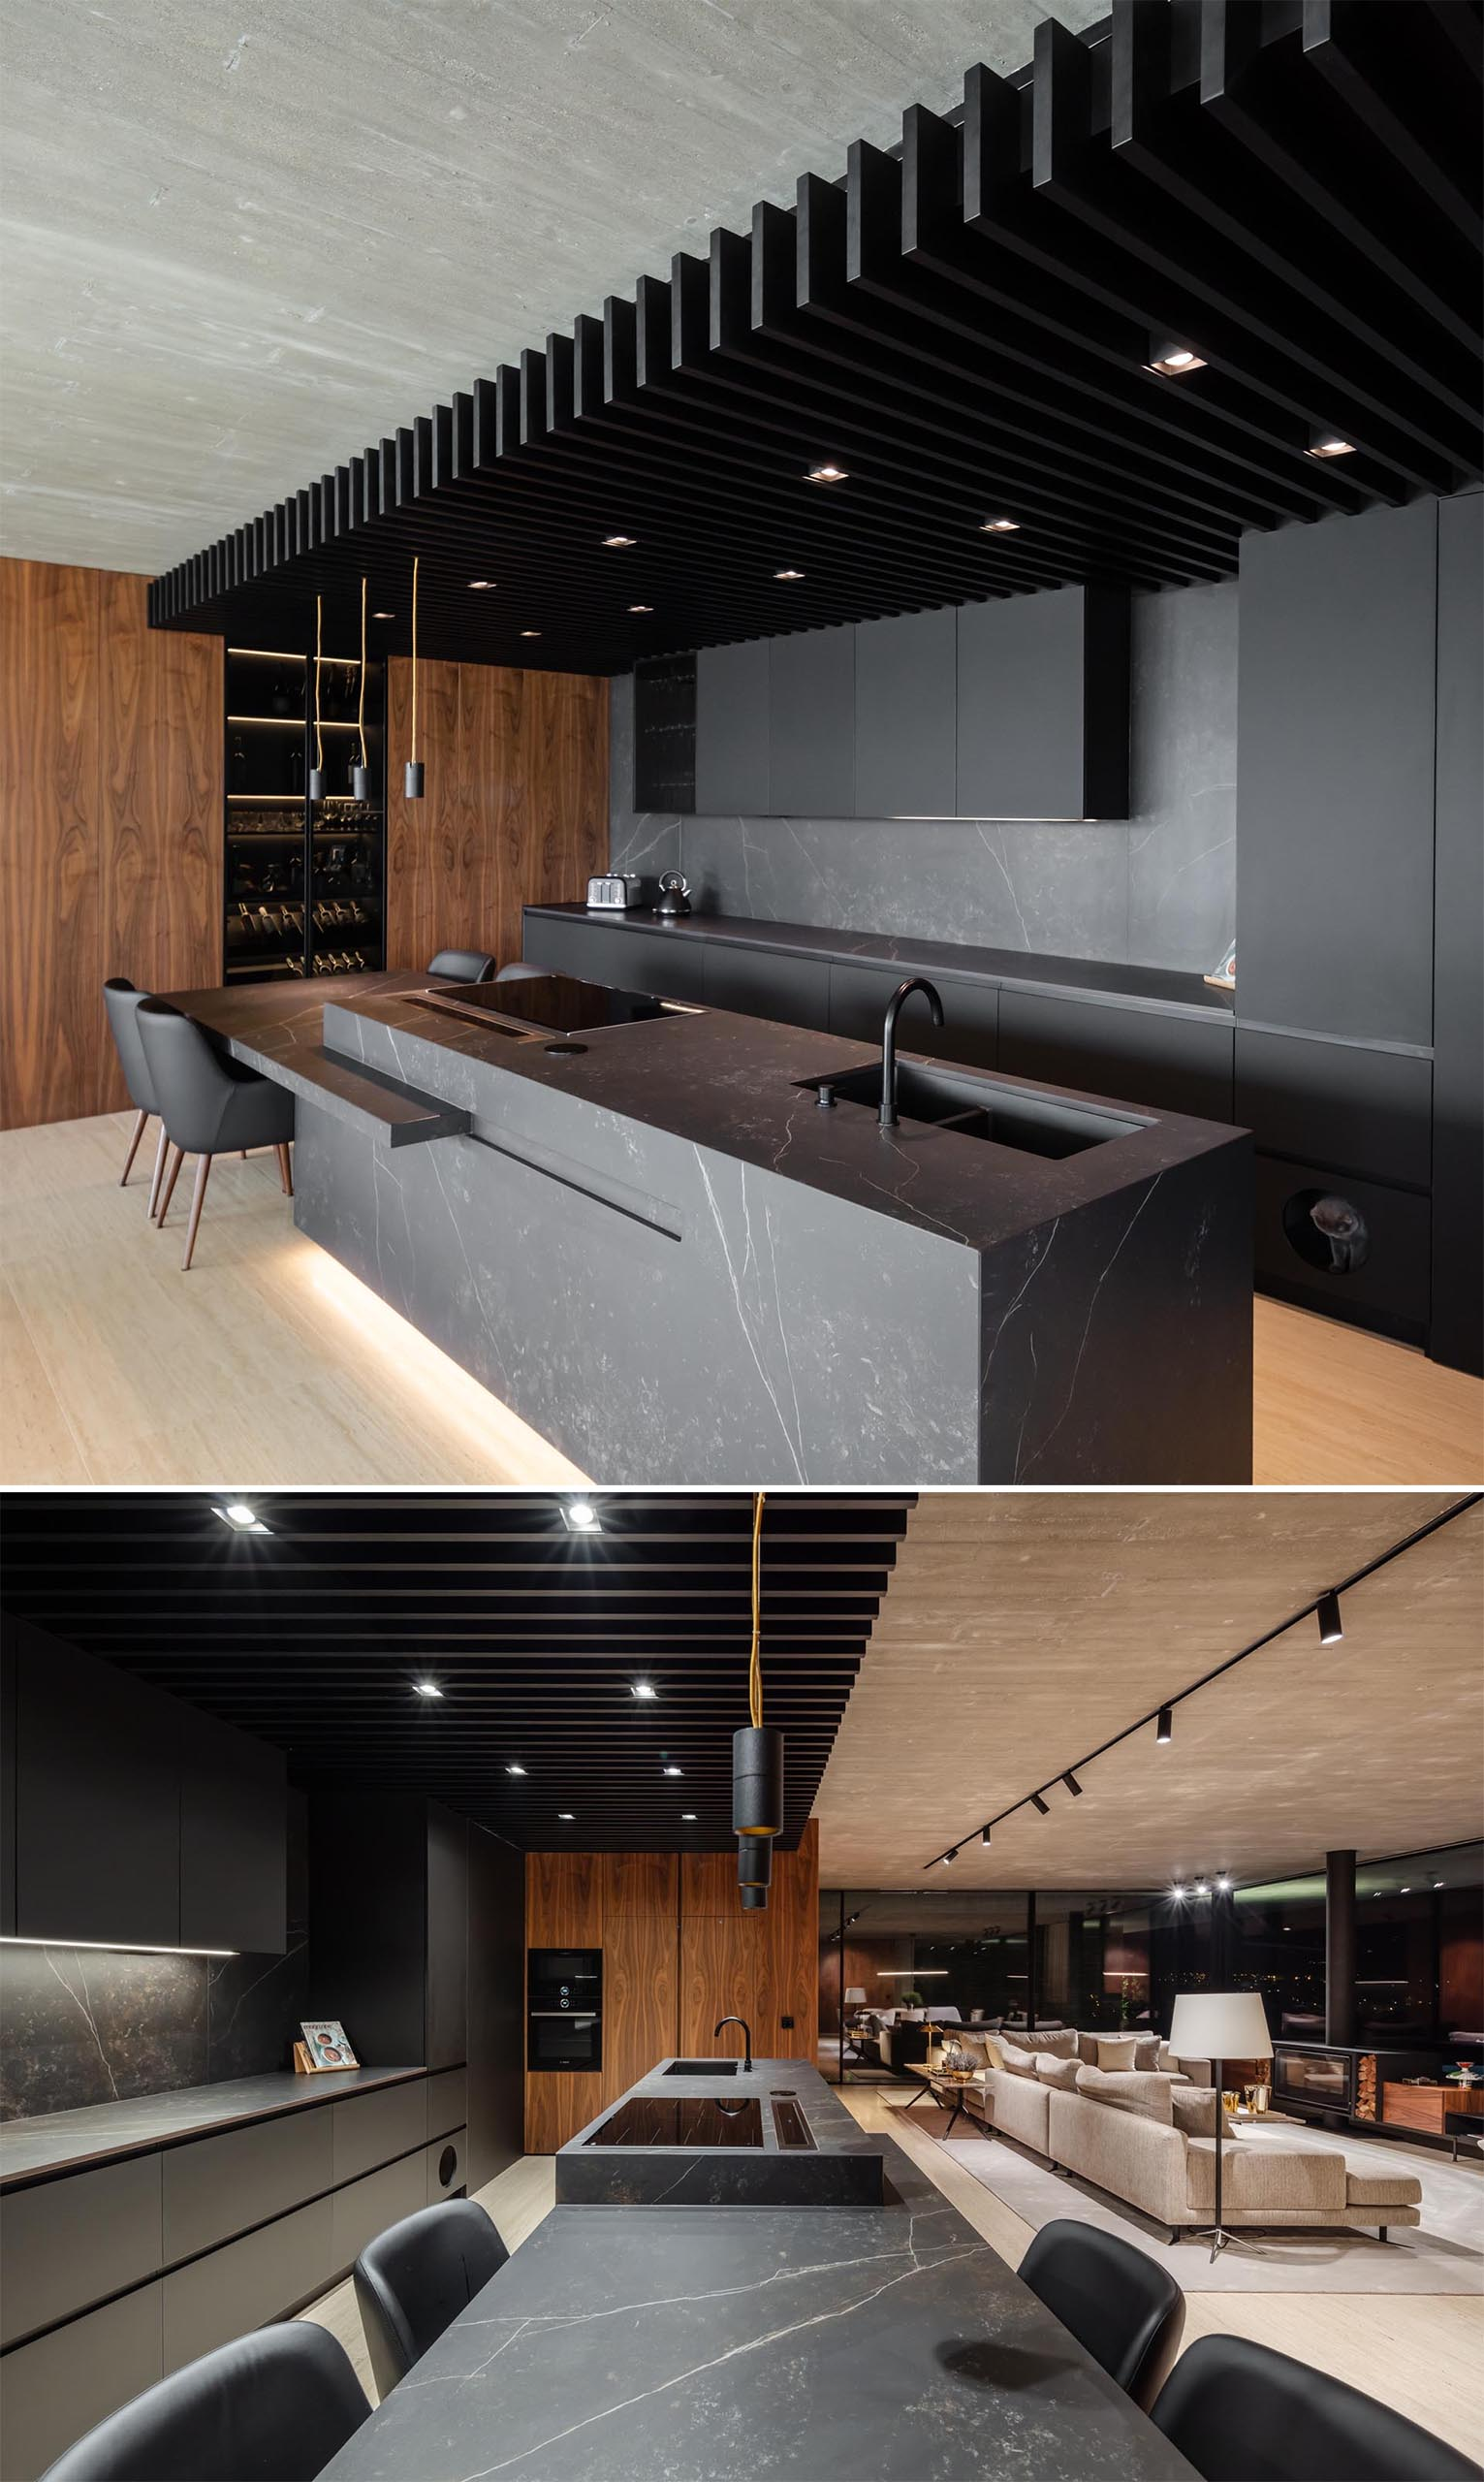 TRAMA arquitetos designed a modern concrete home in Braga, Portugal, that includes a black kitchen.